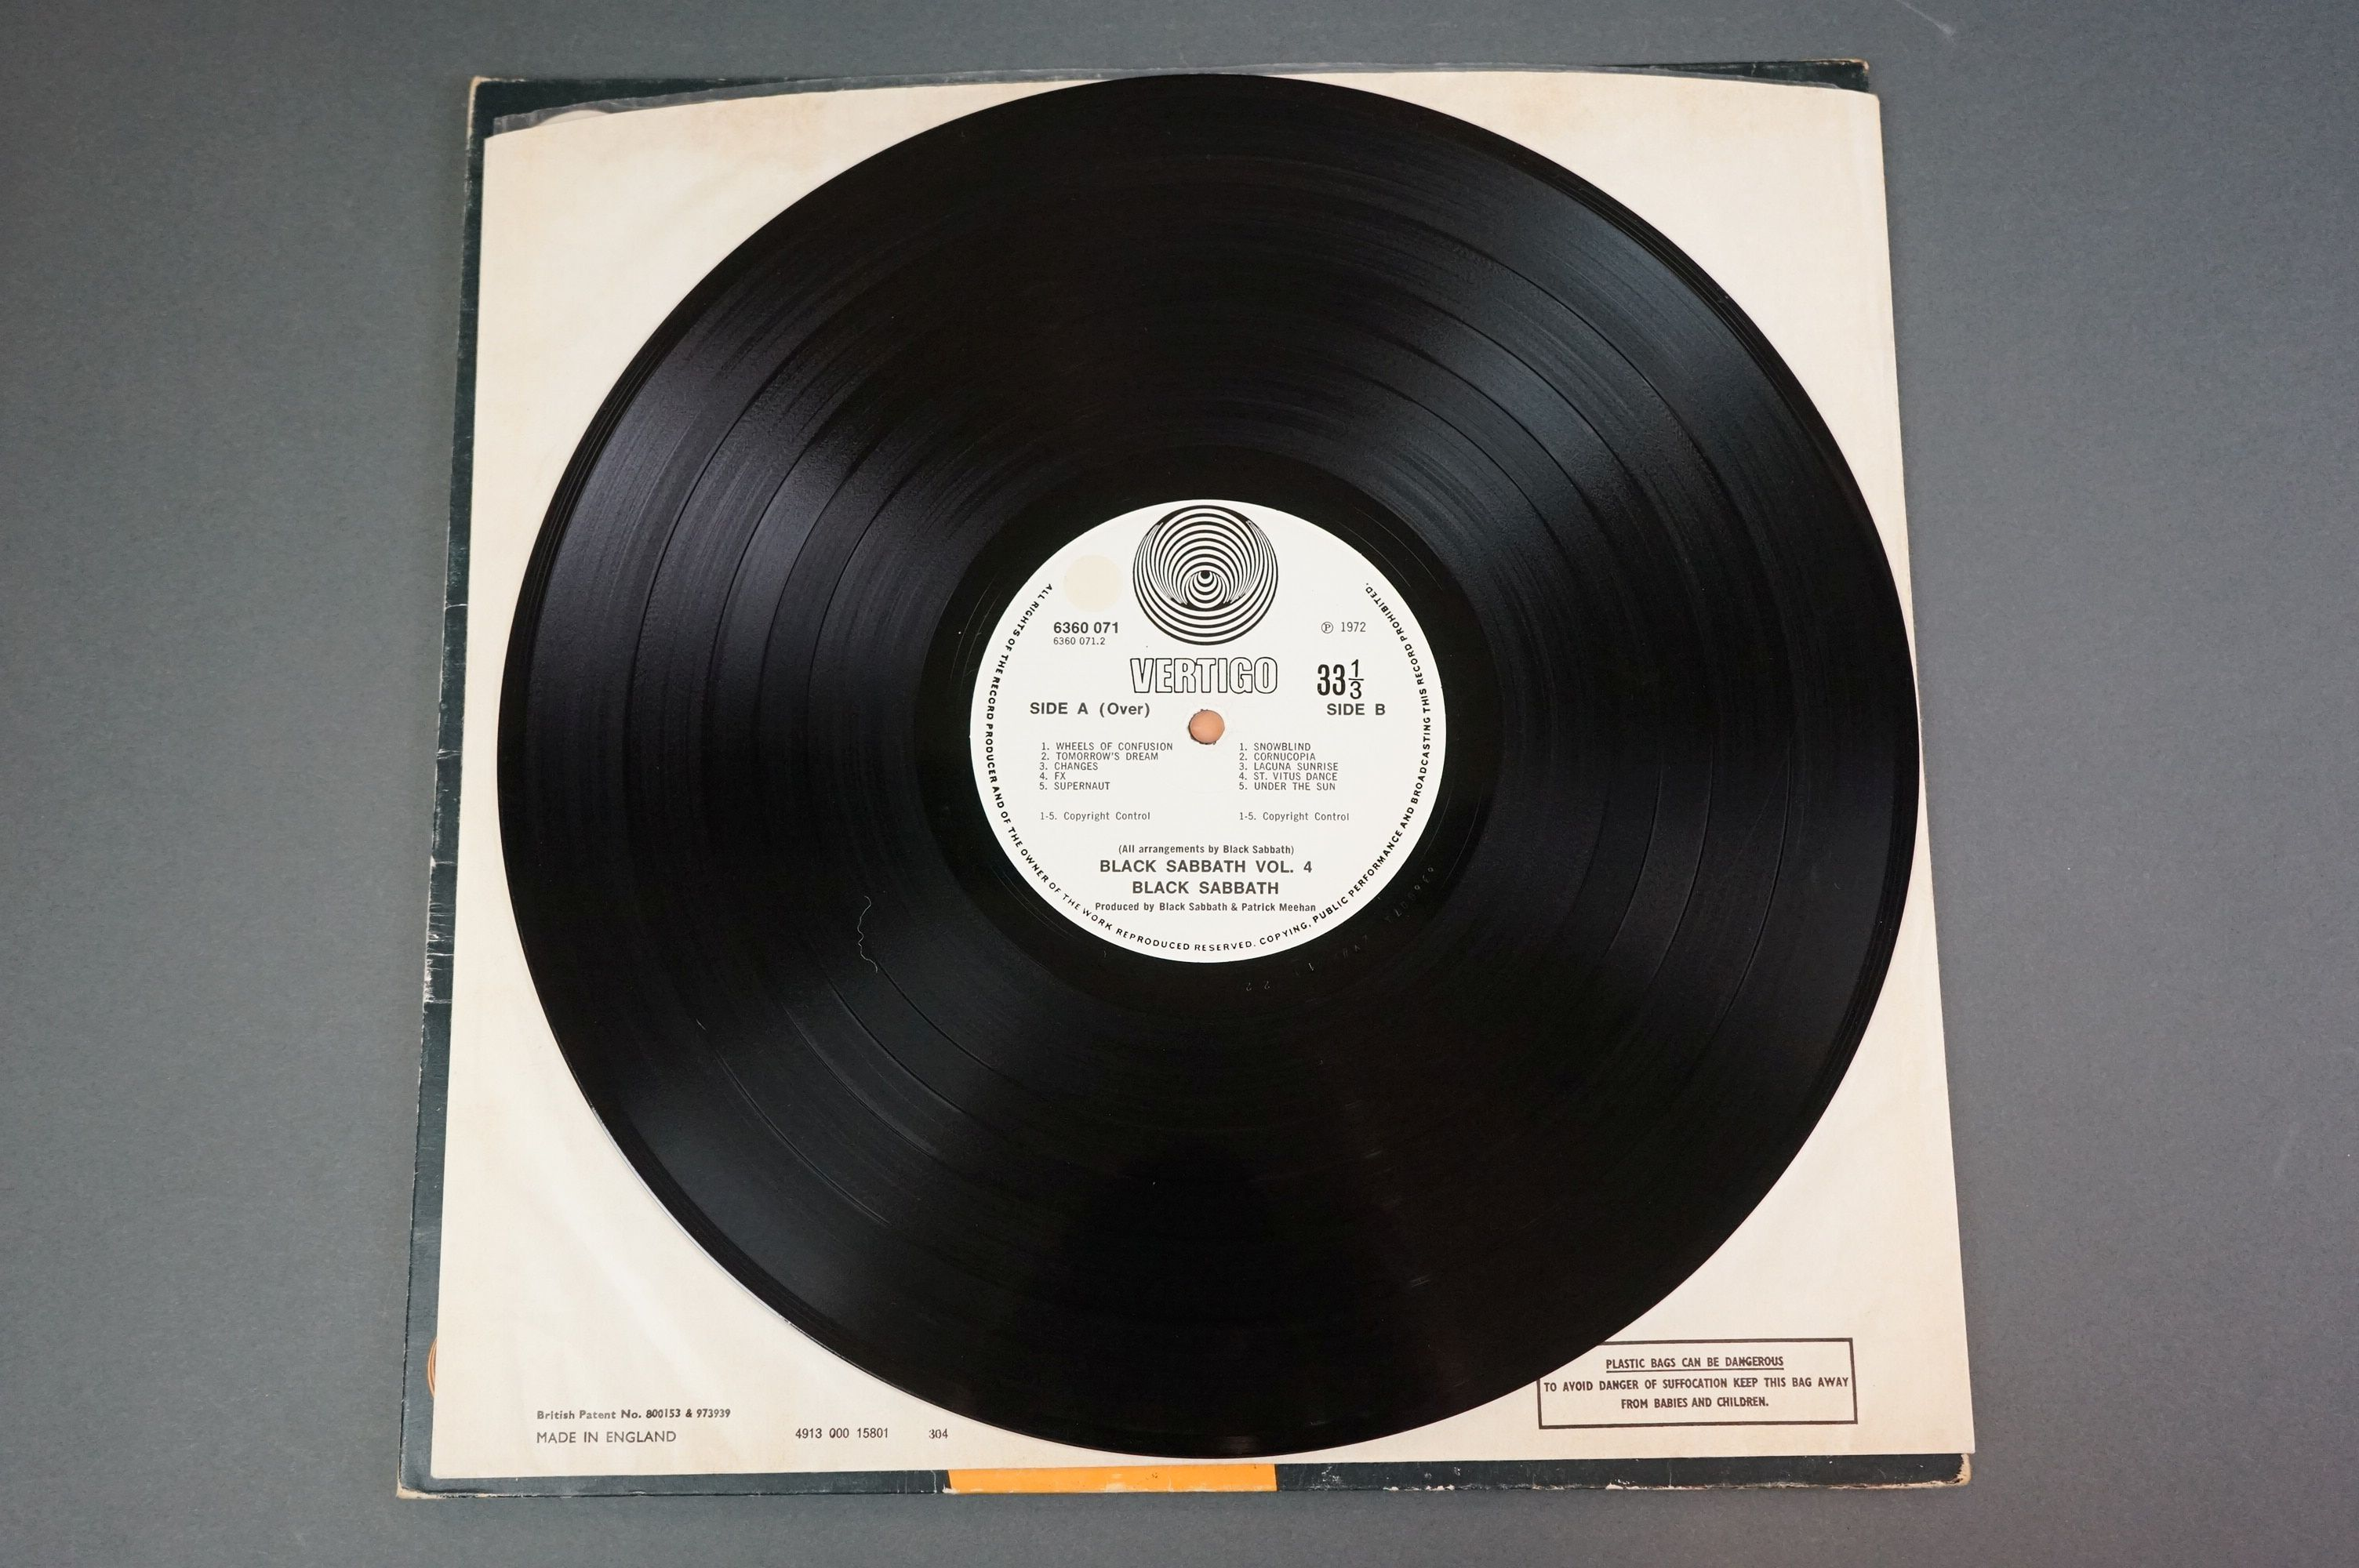 Vinyl - Black Sabbath vol 4 6360071 on Vertigo 1st pressing, no 'made in England' to label, gatefold - Image 5 of 6